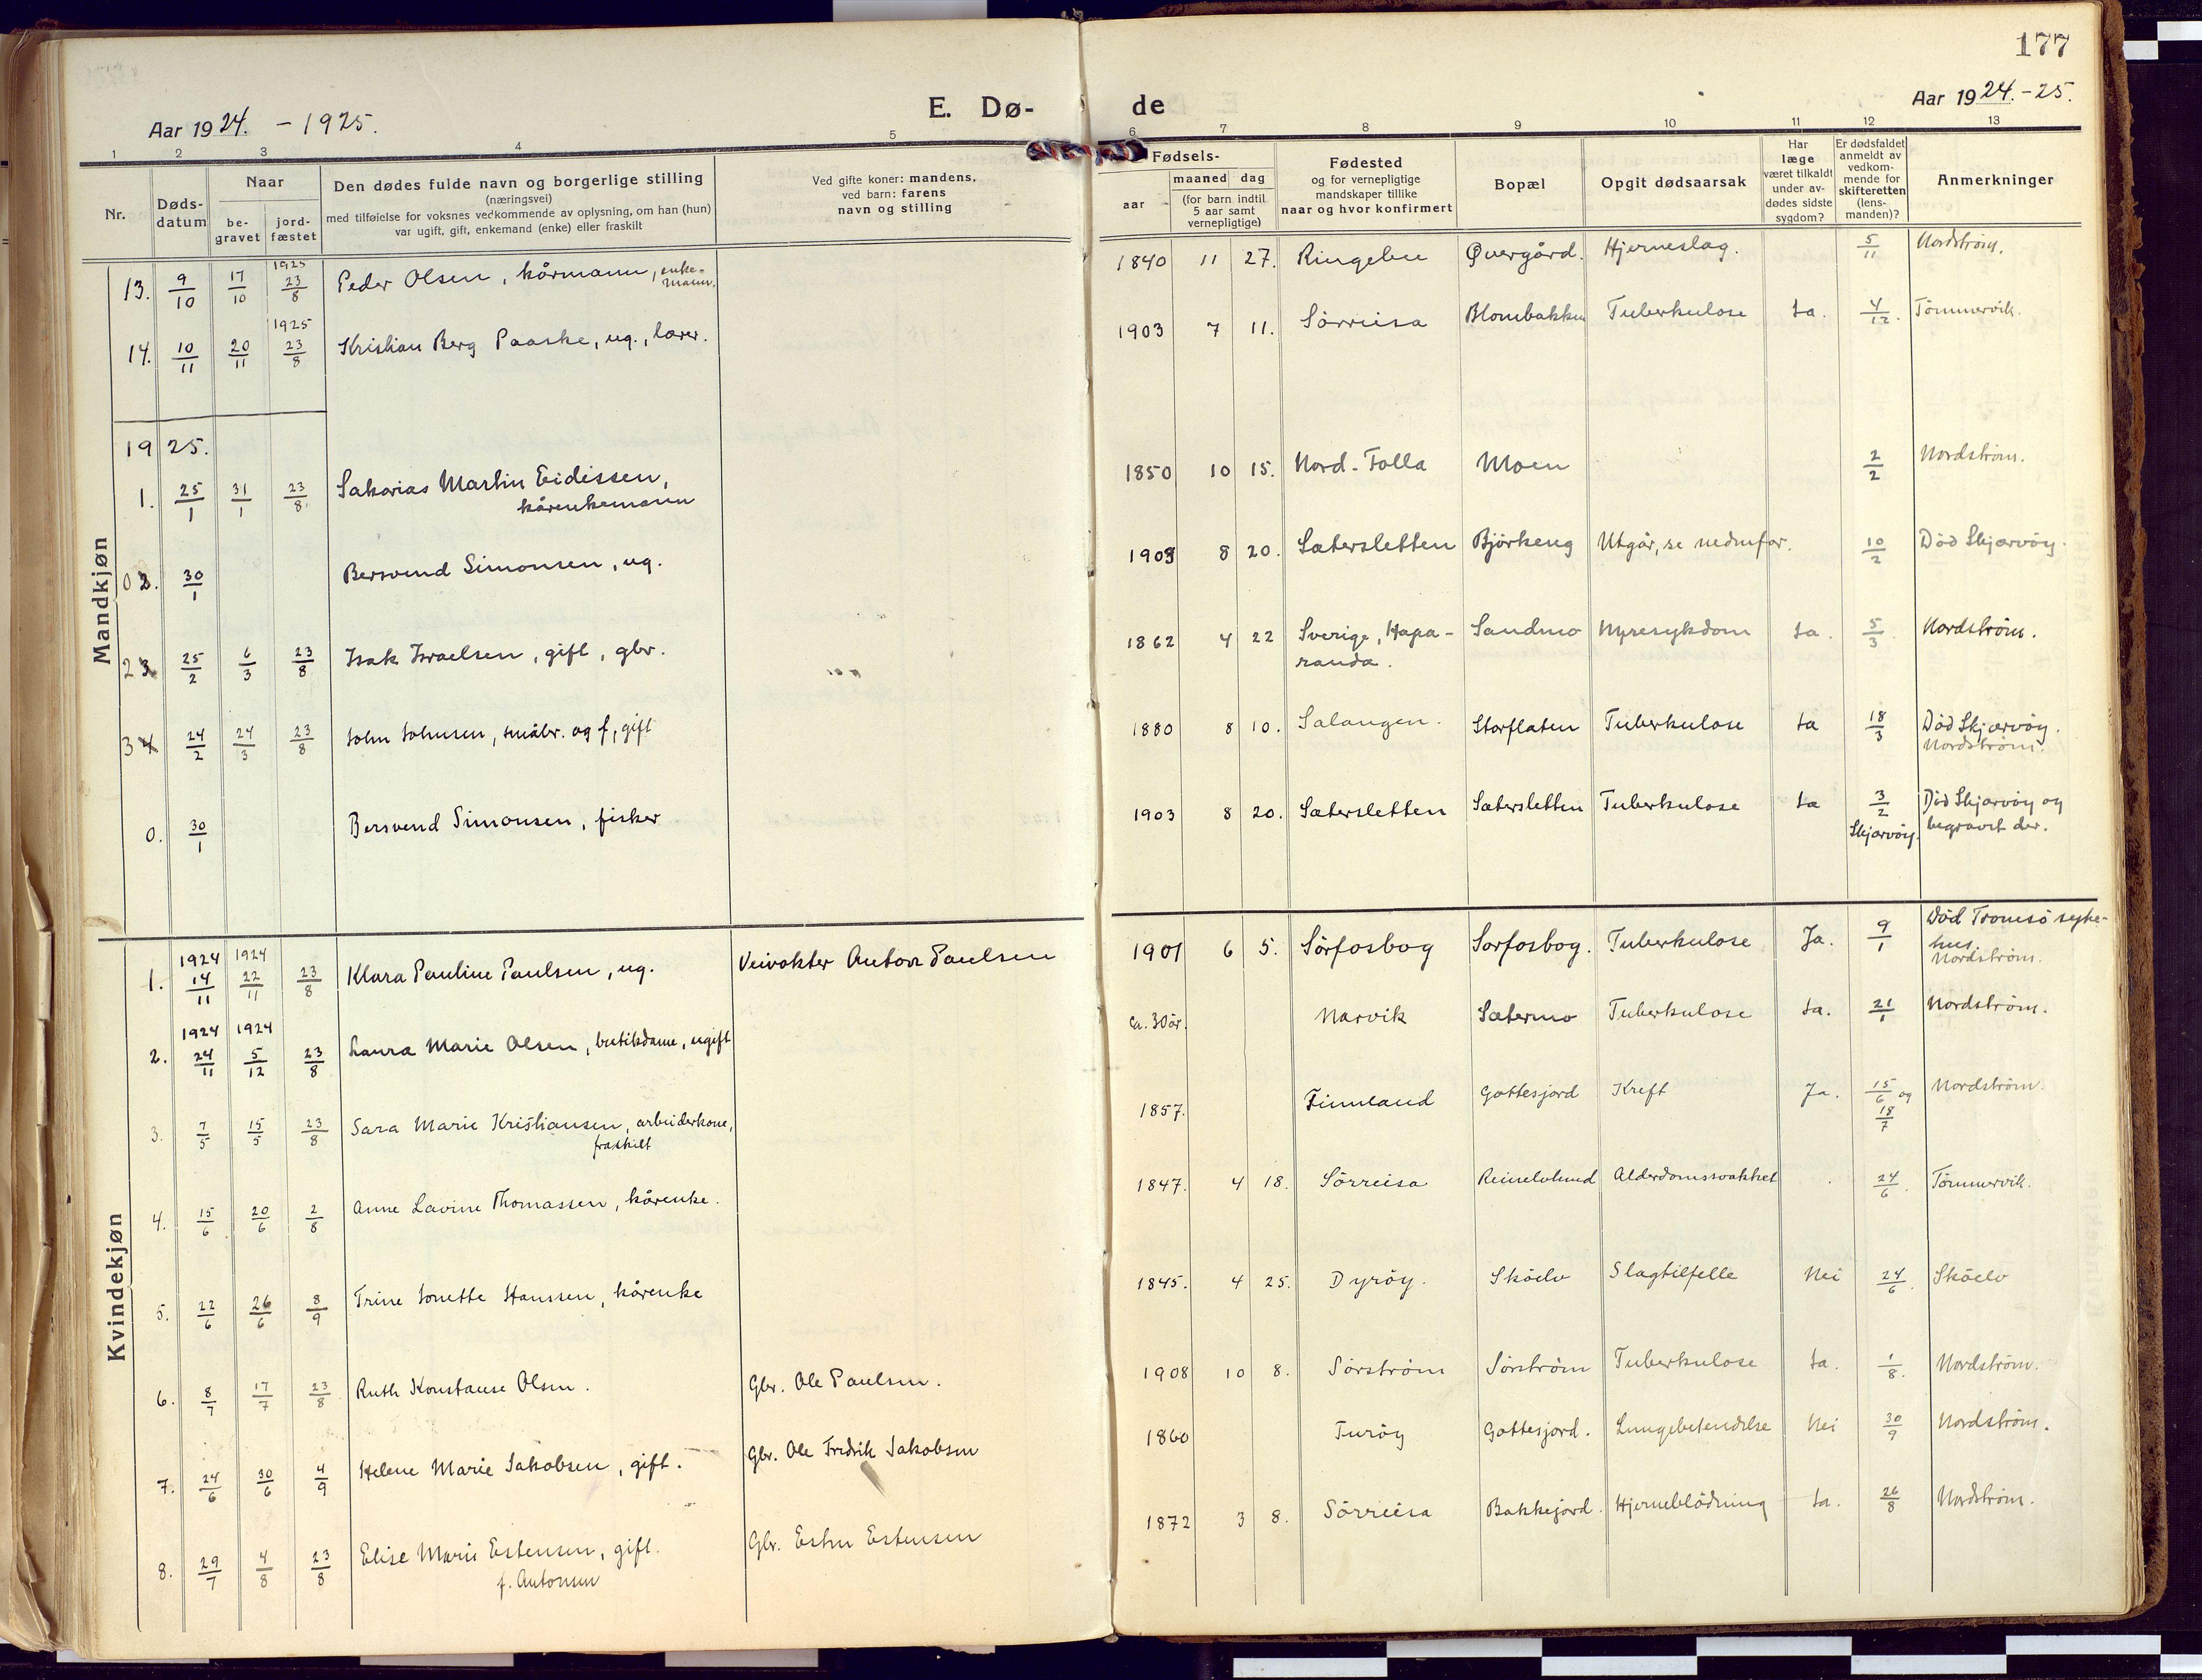 SATØ, Tranøy sokneprestkontor, I/Ia/Iaa/L0015kirke: Ministerialbok nr. 15, 1919-1928, s. 177